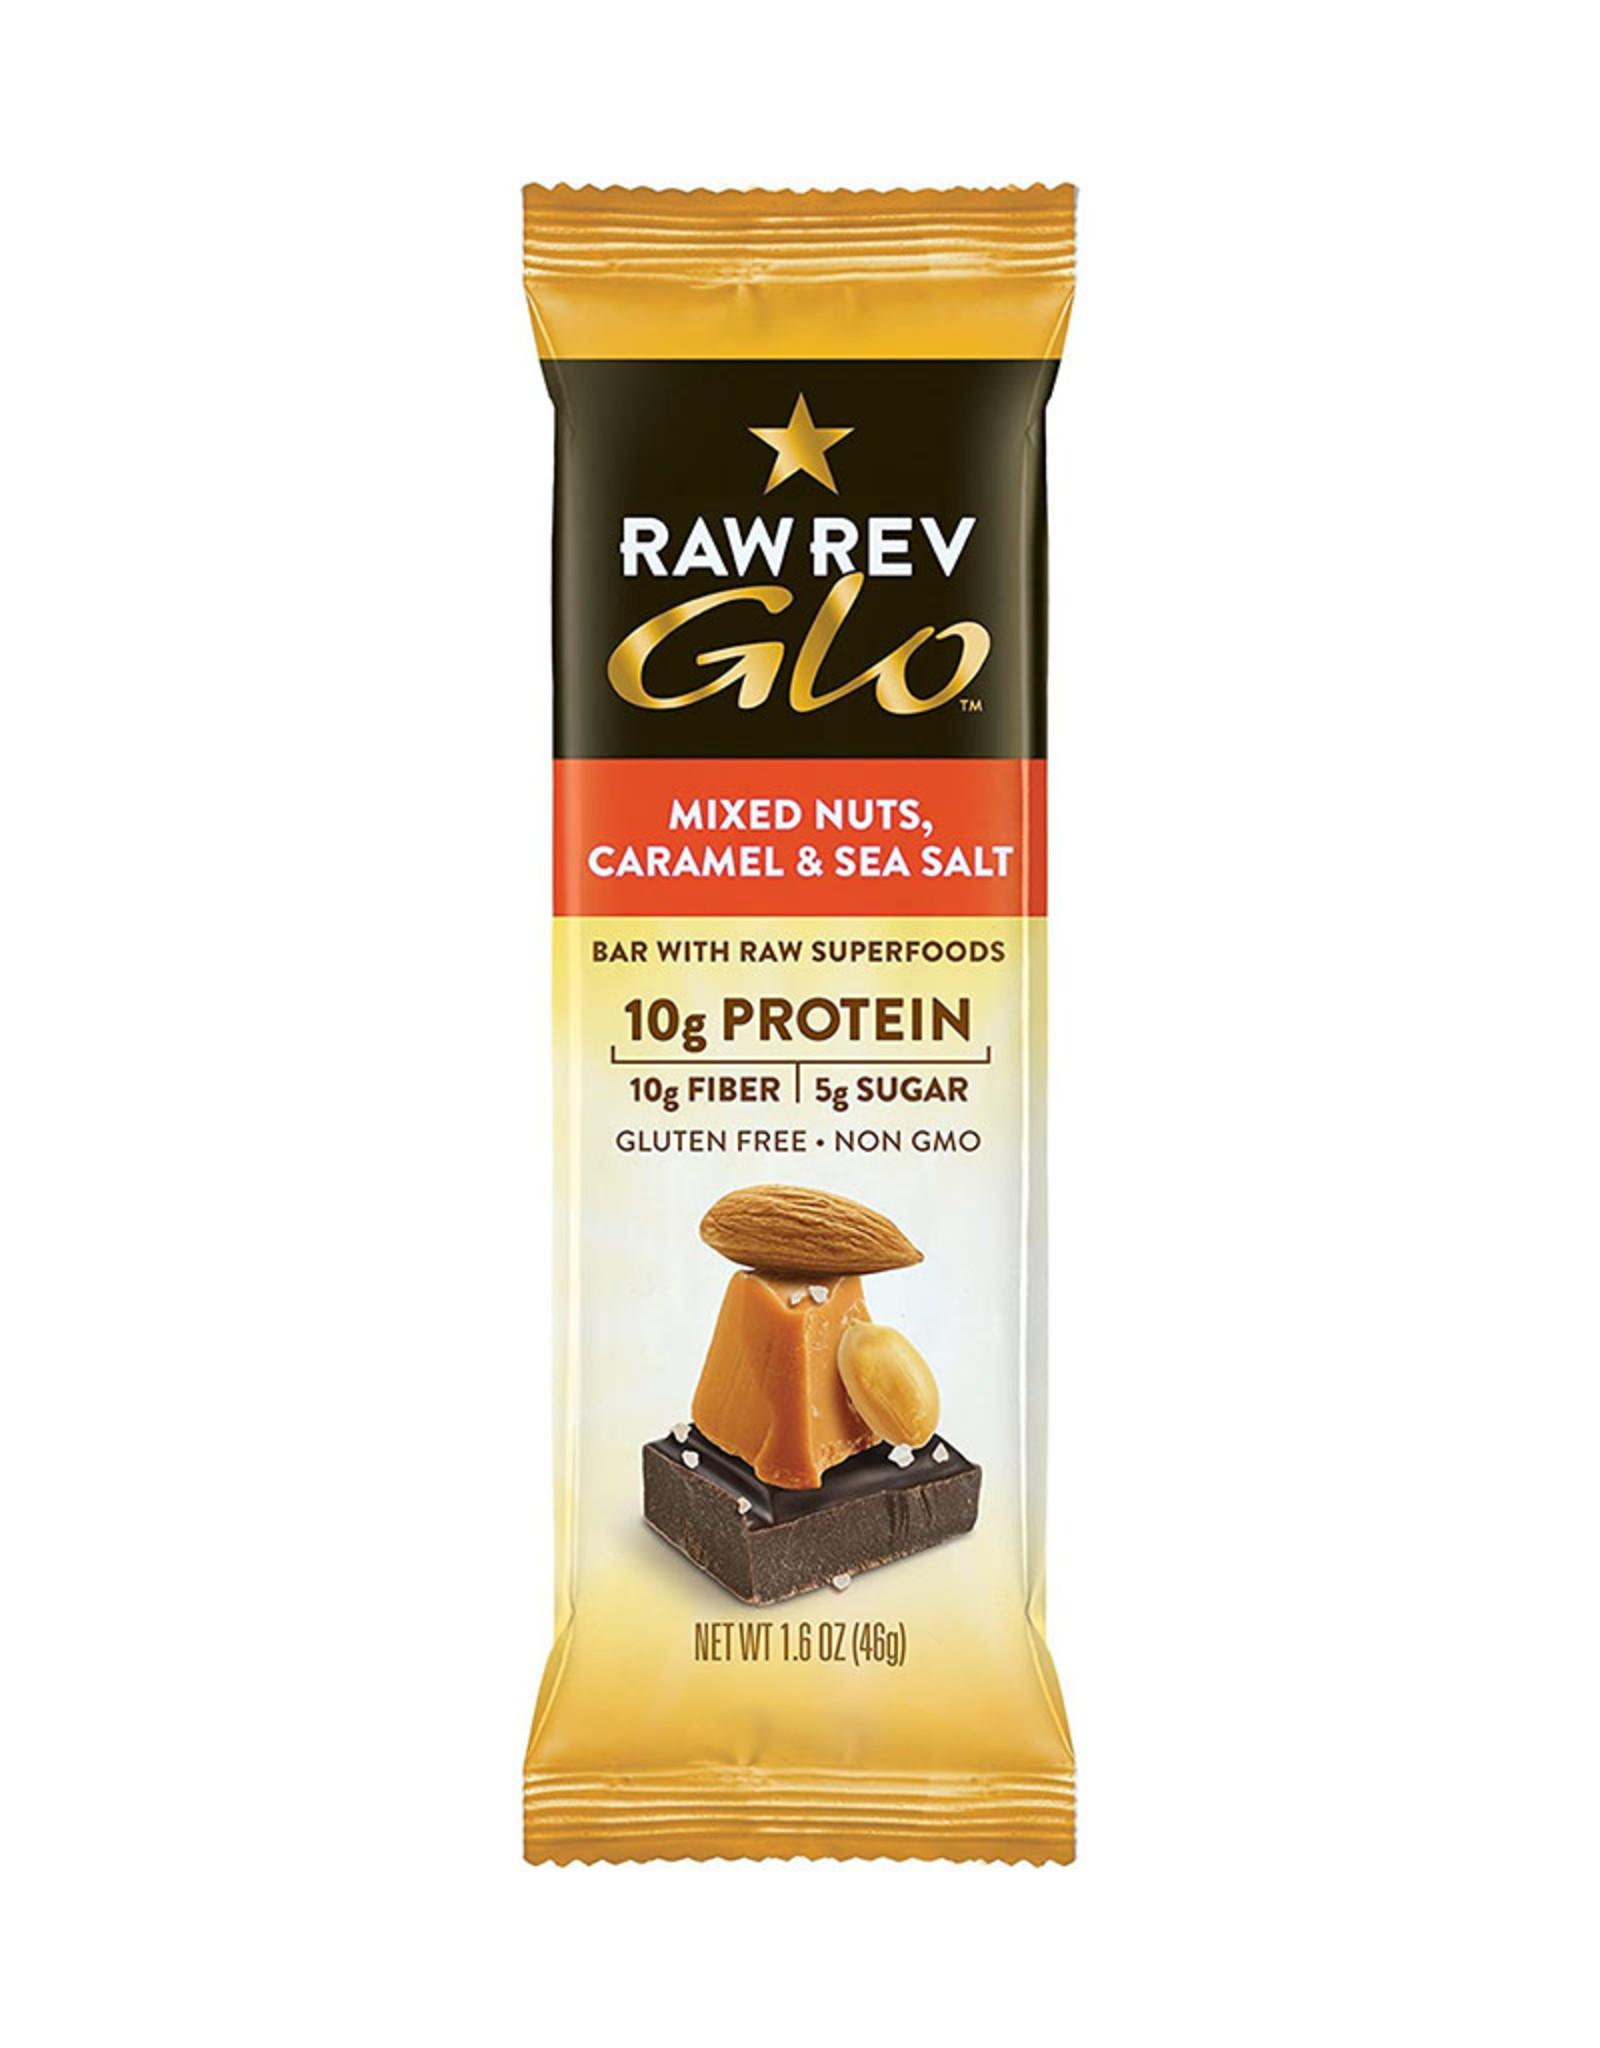 RAW Revolution Raw Revolution - Glo, Mixed Nuts Caramel & Sea Salt